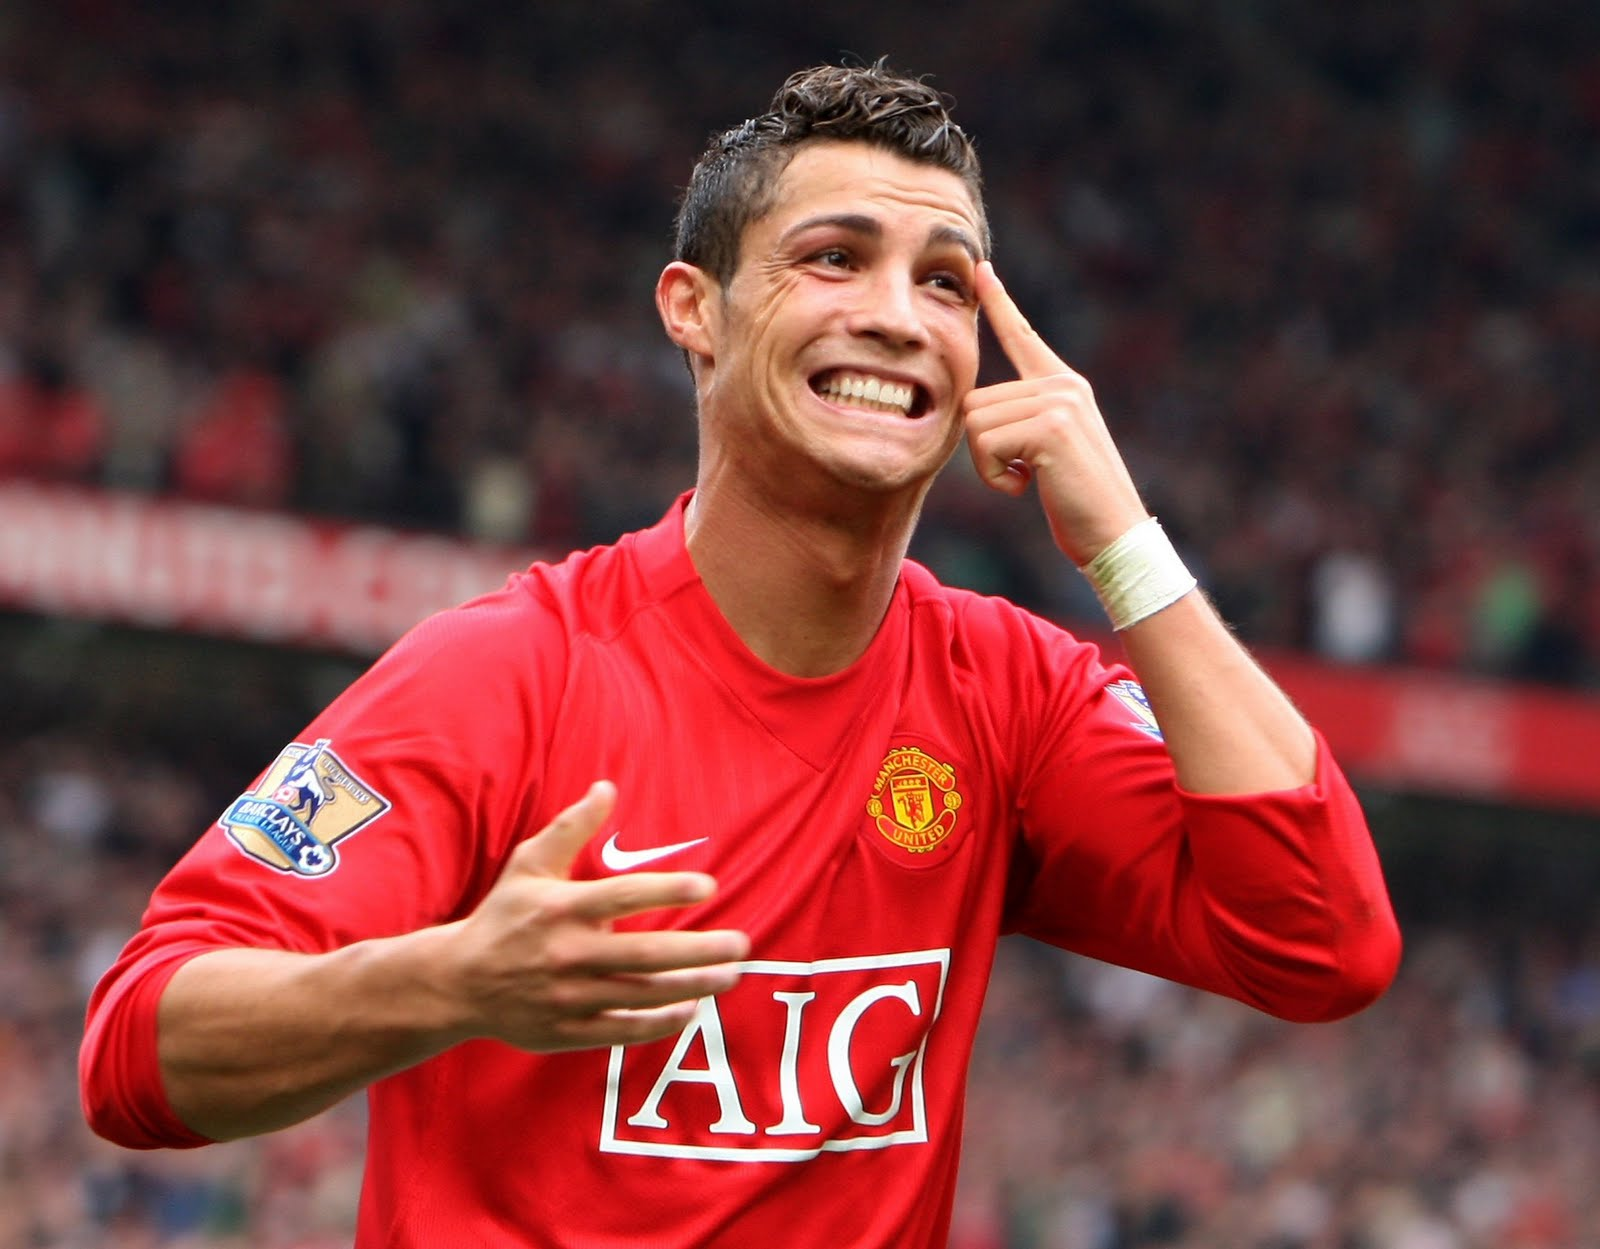 Barbietch Cristiano Ronaldo Latest Pictures And Wallpaper